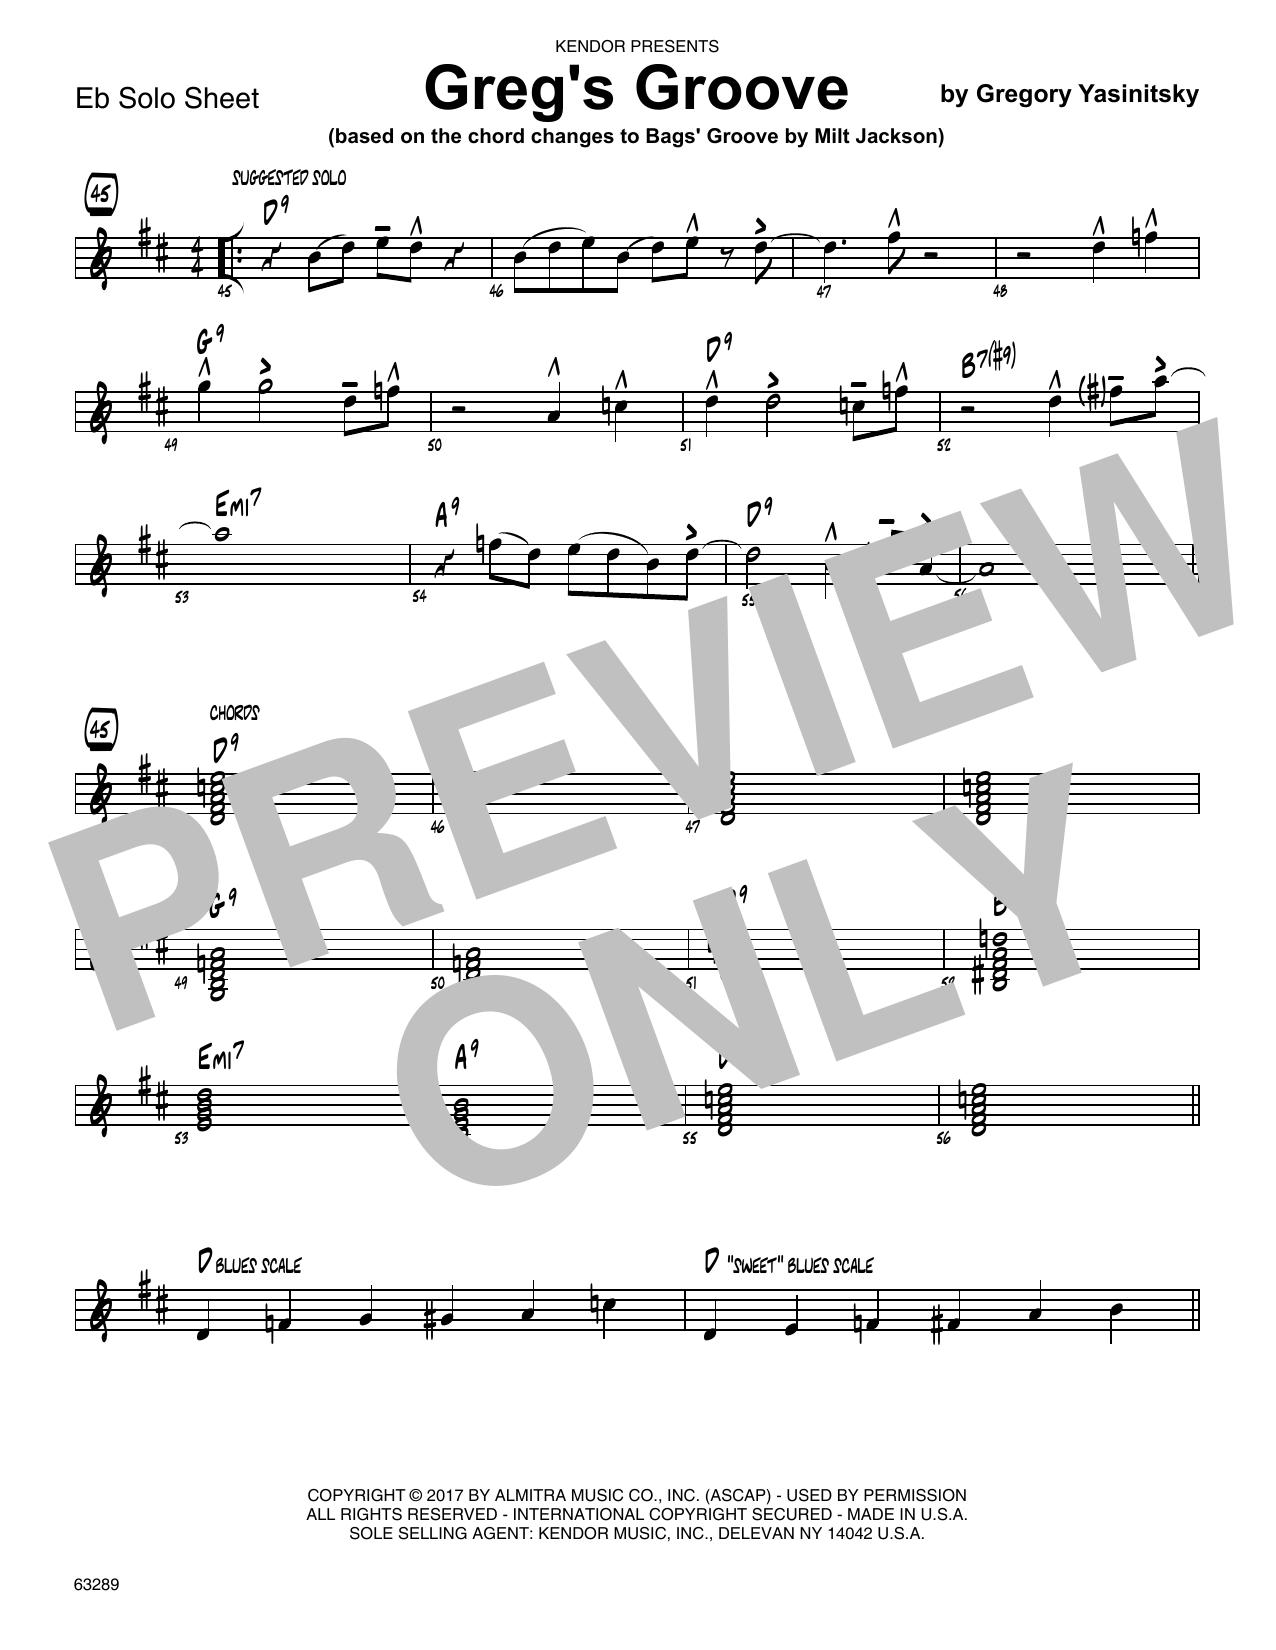 Greg's Groove - Solo Sheet - Alto Sax Sheet Music